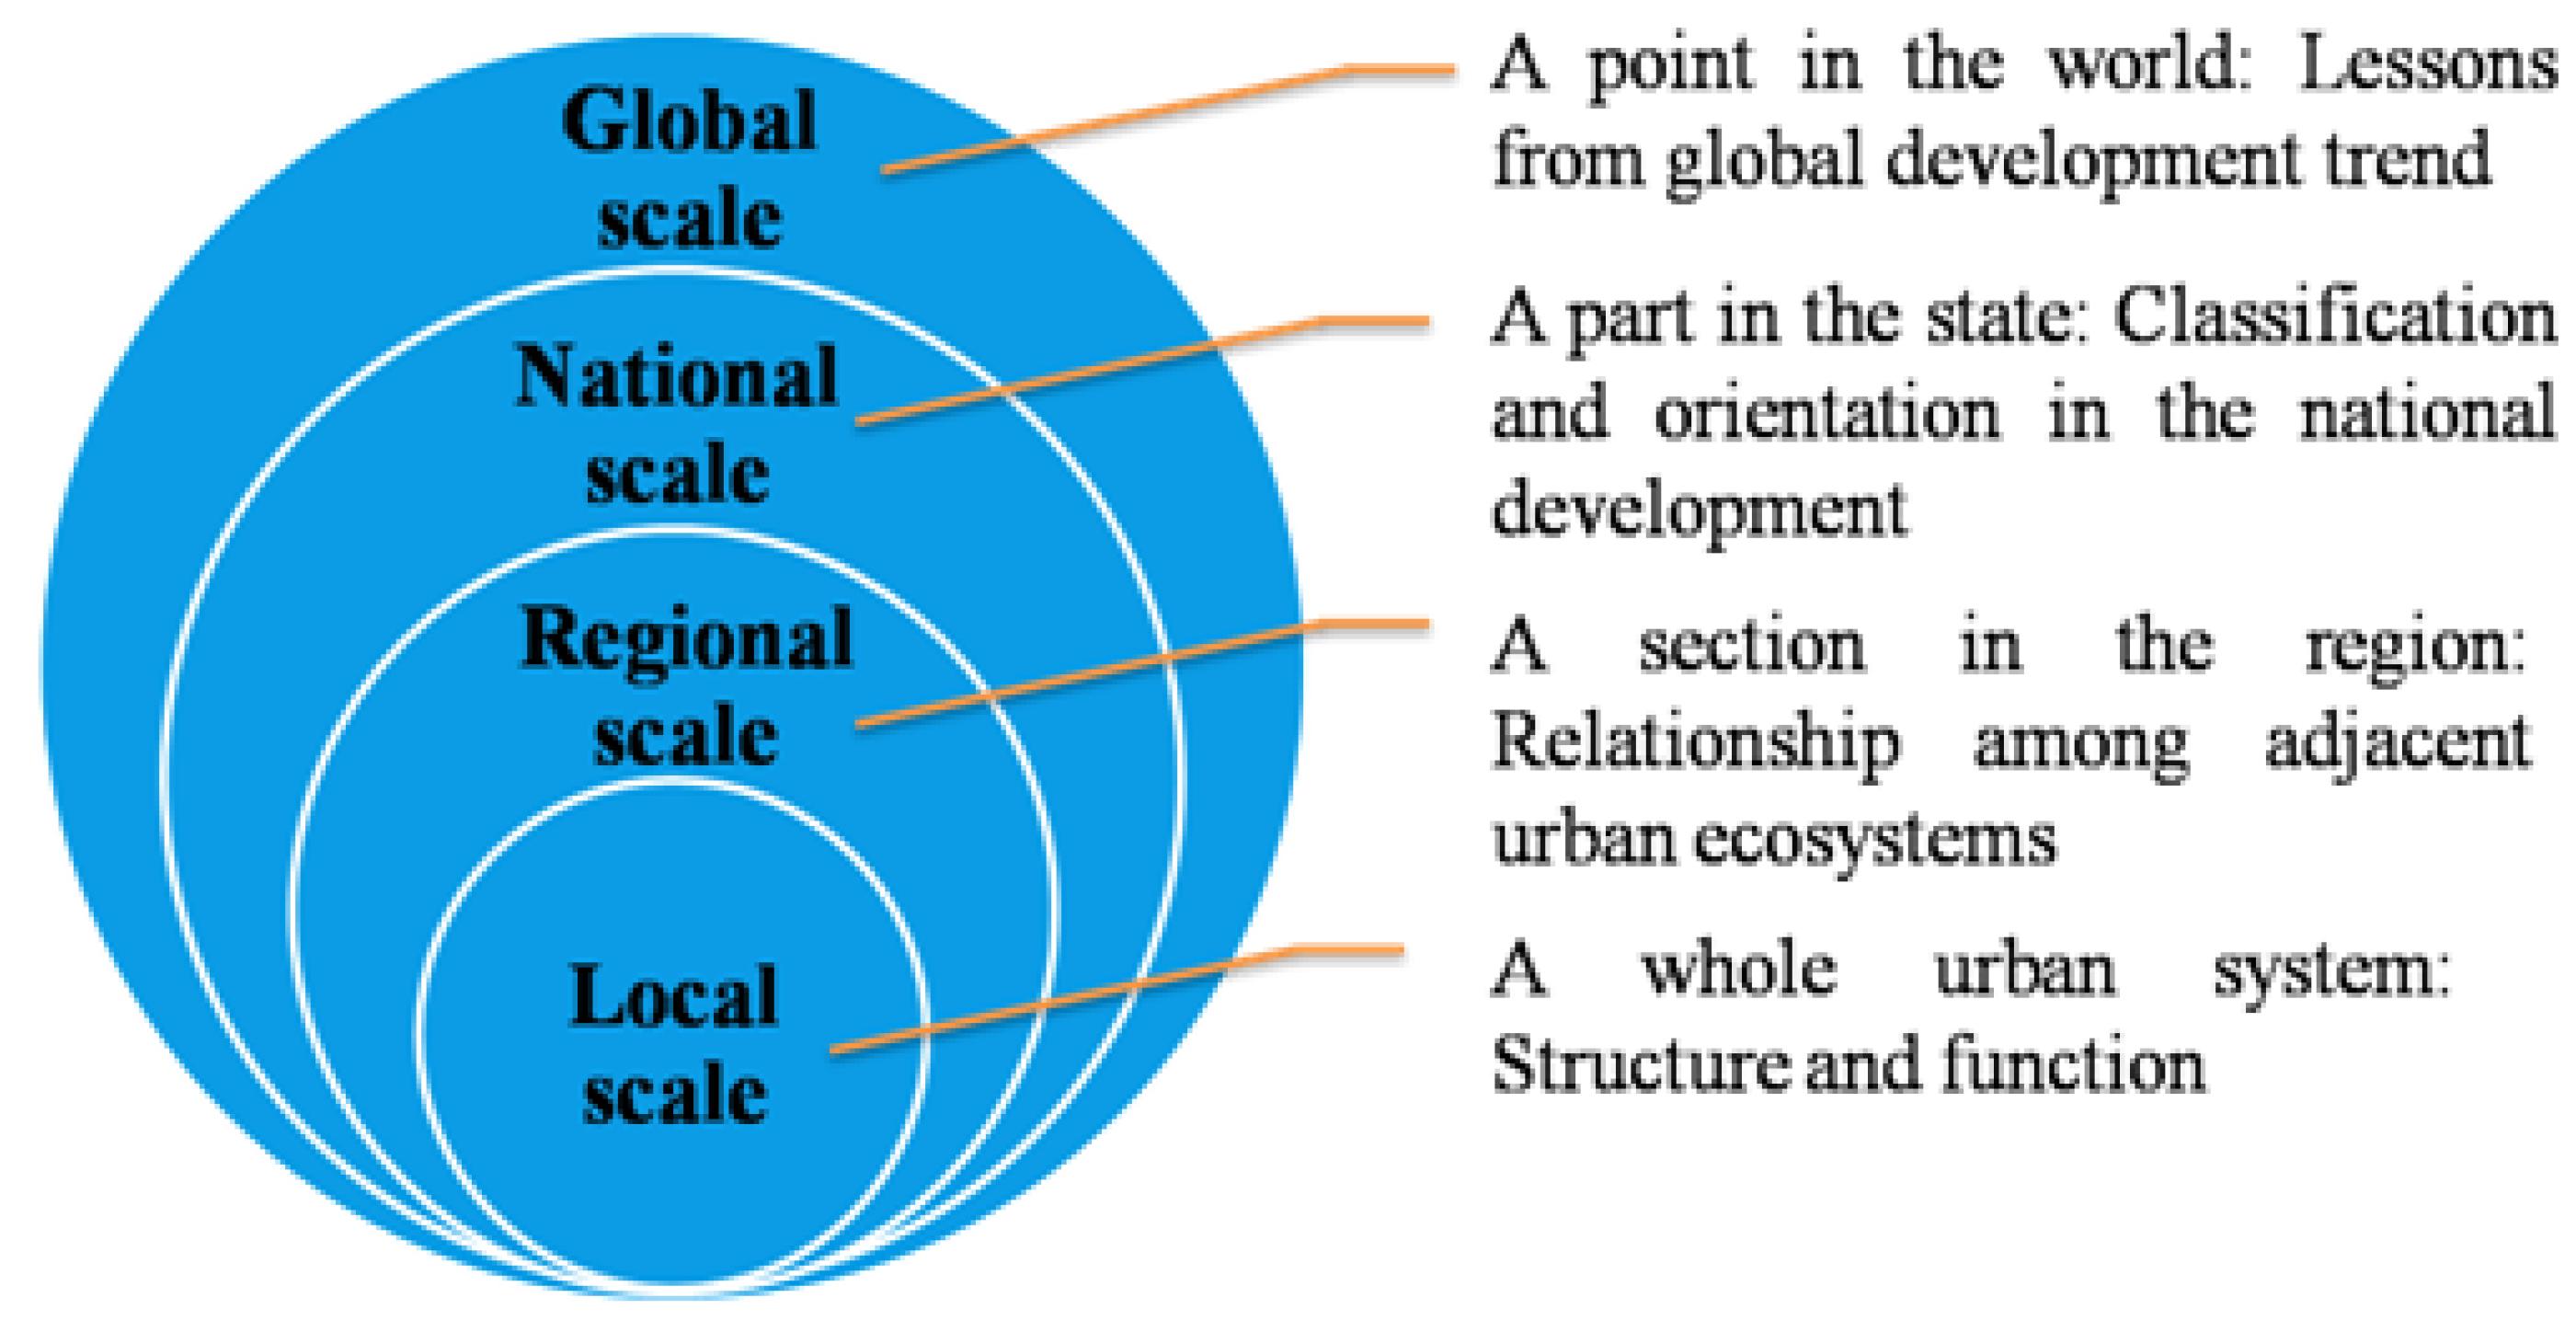 citizen relationship and urban management development